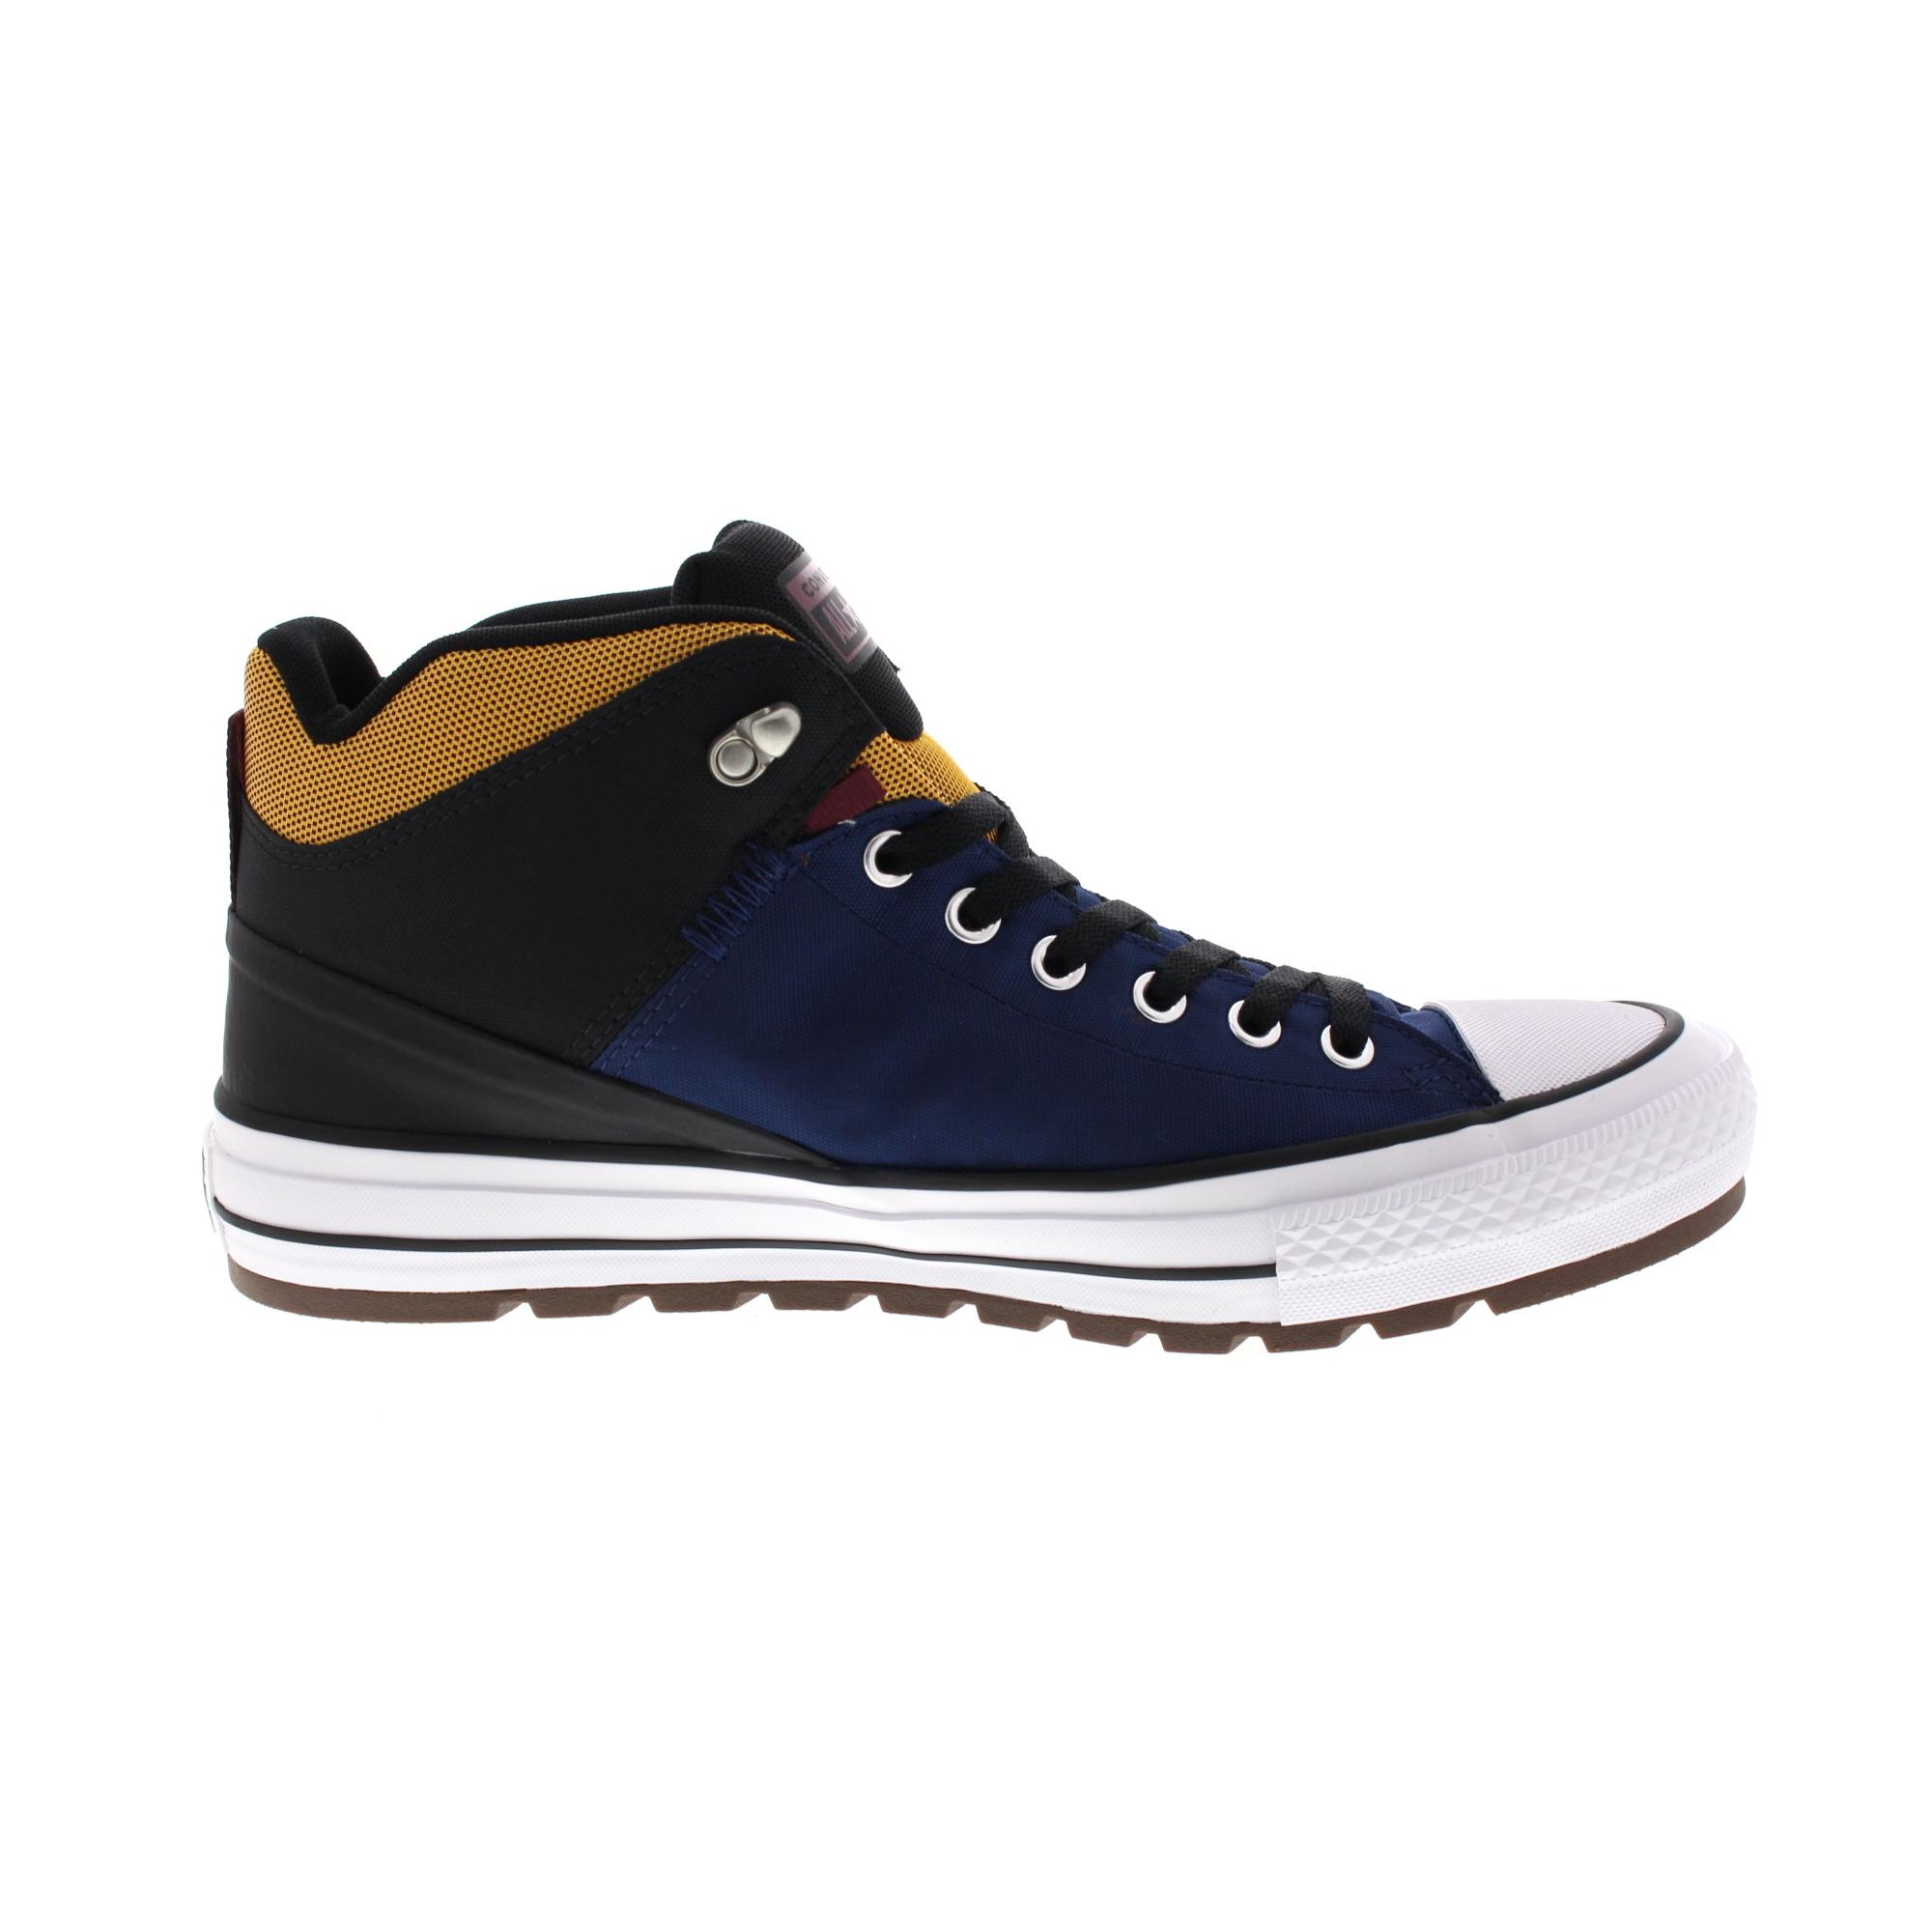 d4c9d60560de05 Ghete unisex Converse Ctas Street Boot HI 161471C - Glami.ro